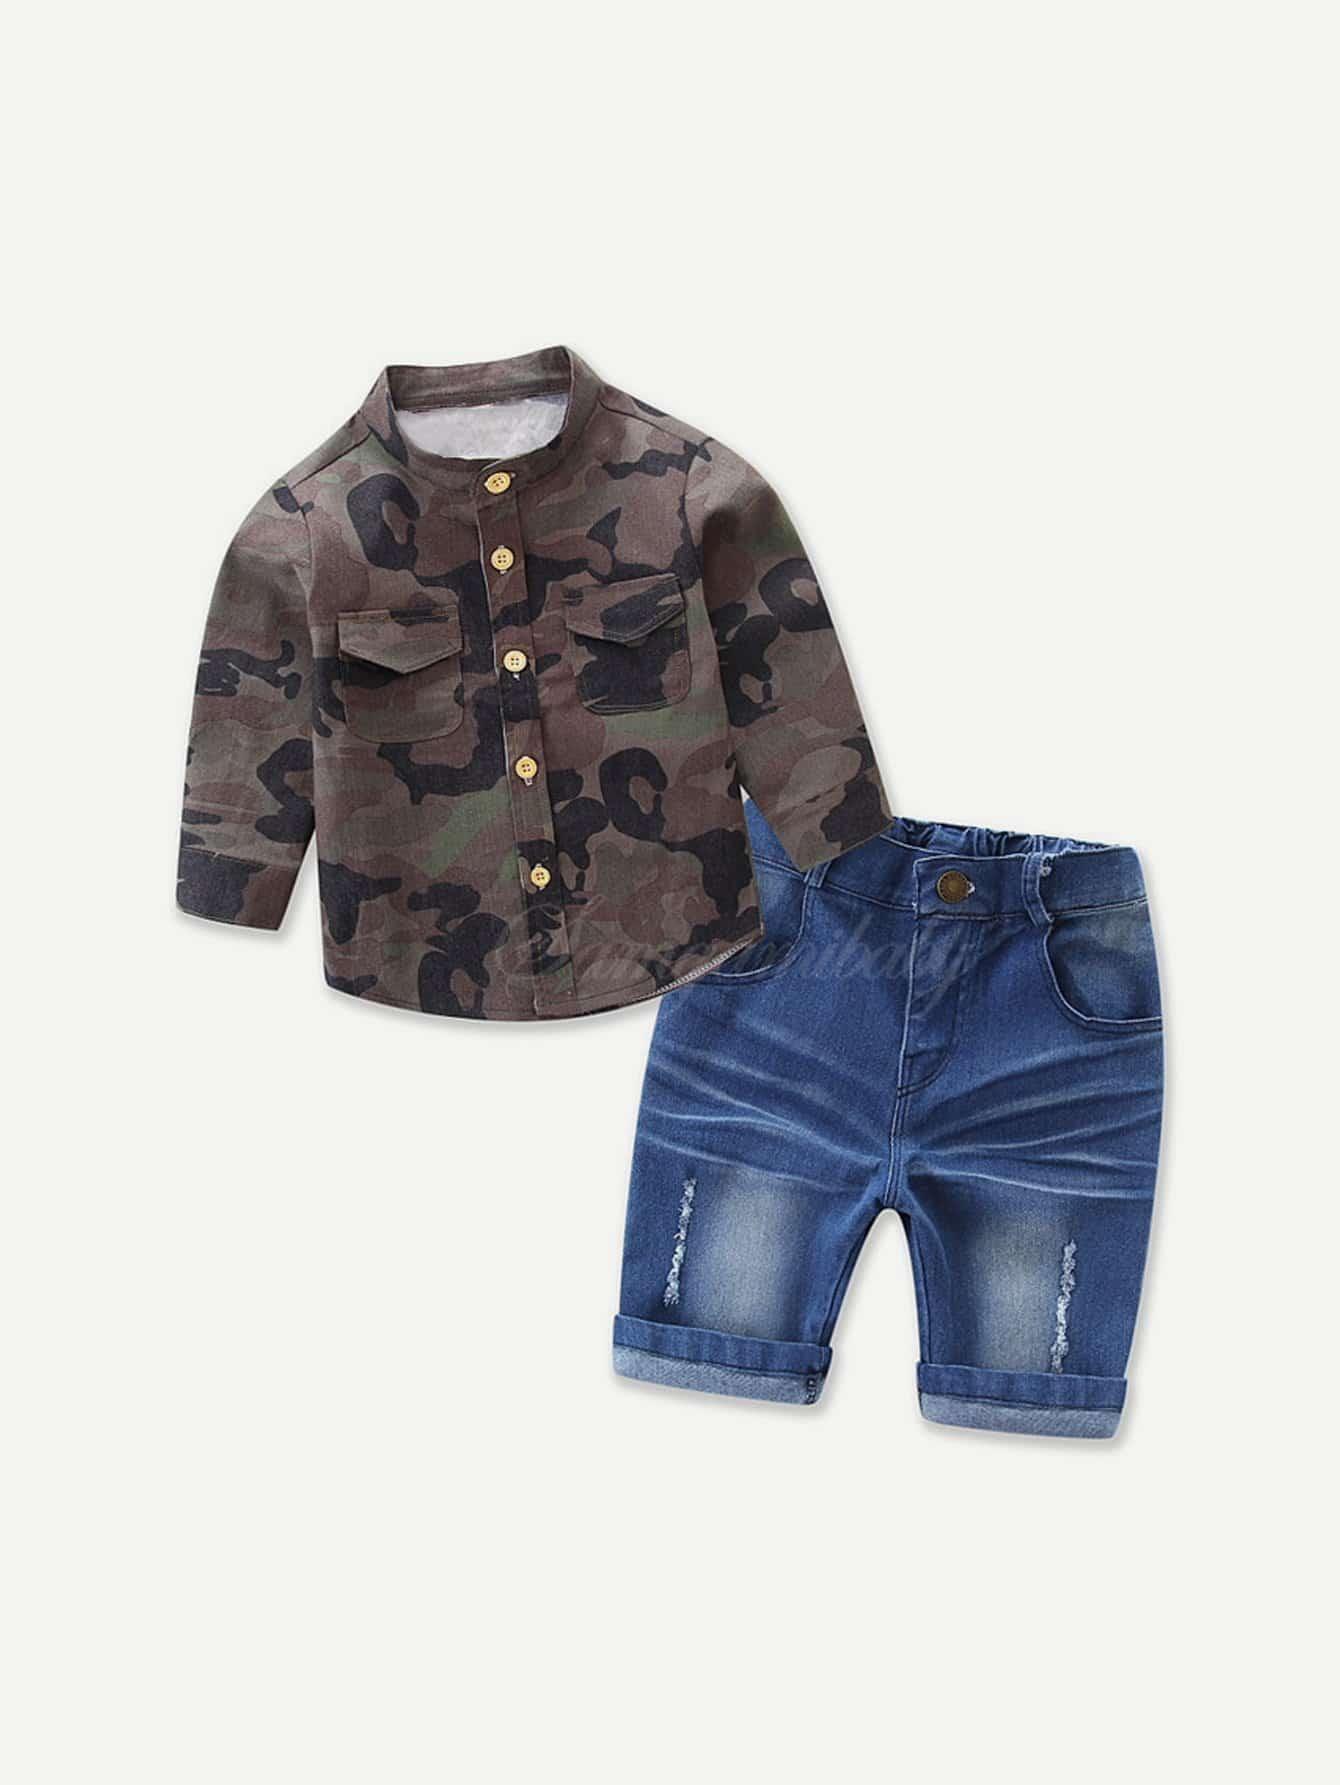 Boys Camo Shirt With Denim Shorts boys roll up sleeve plaid shirt with shorts